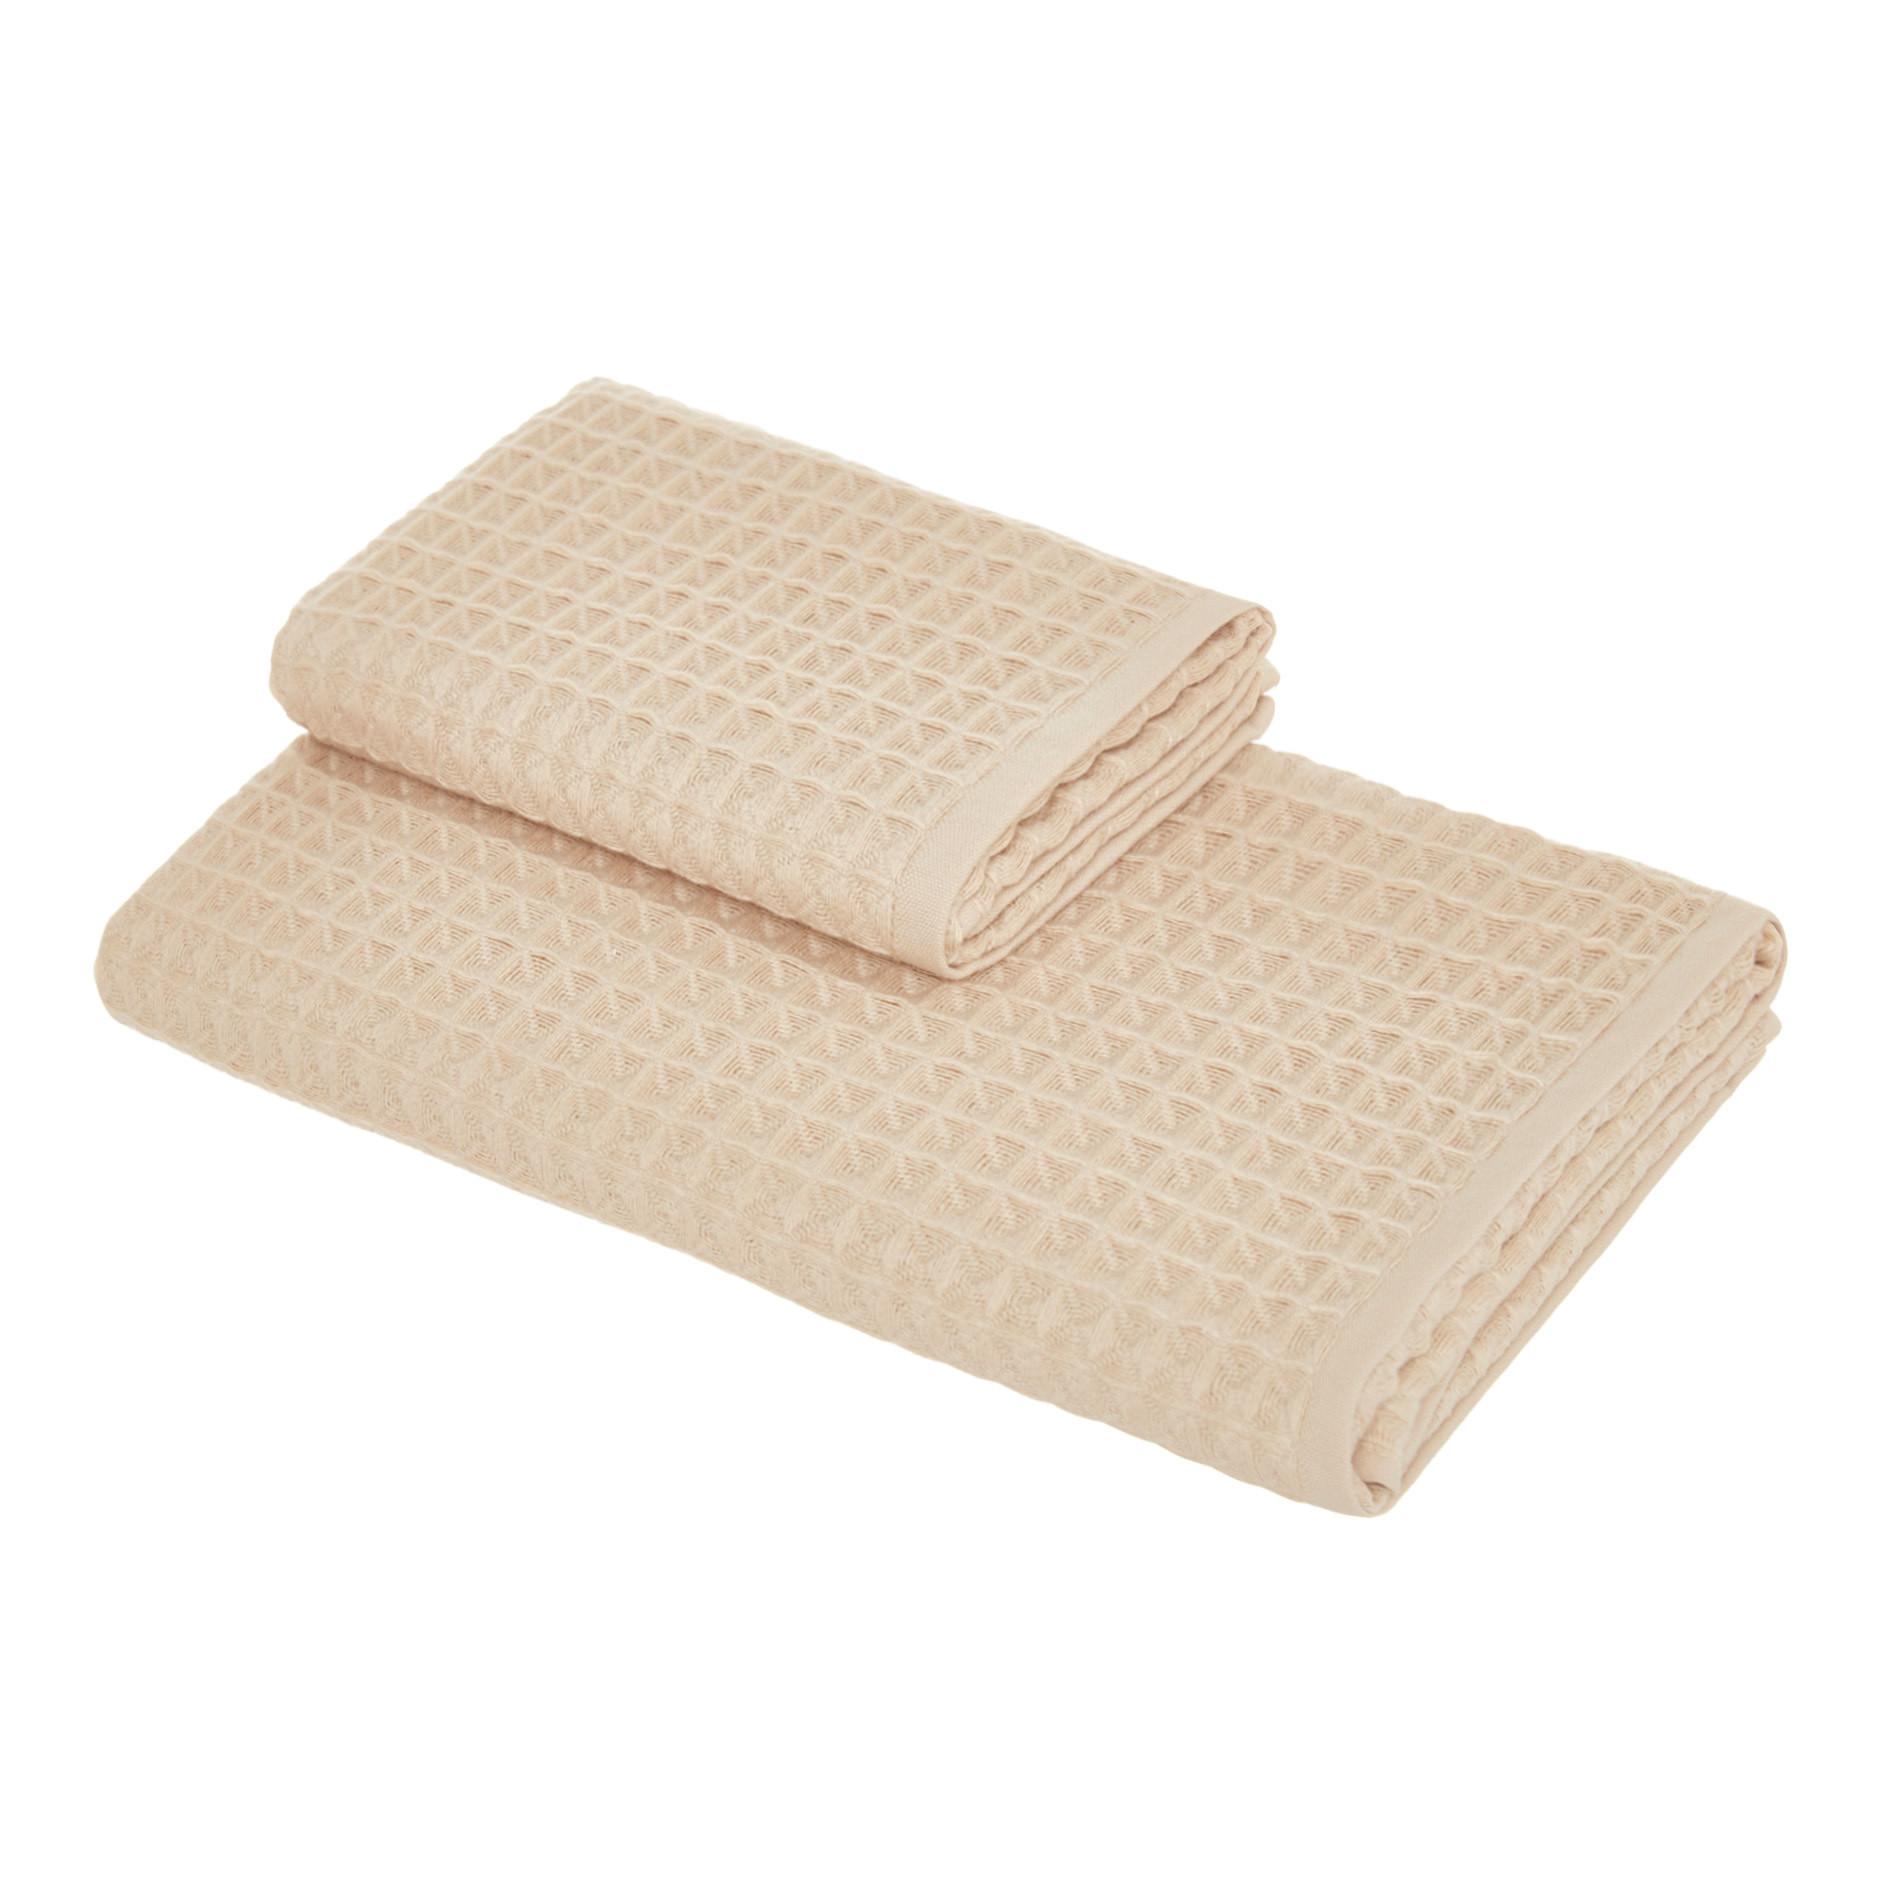 Set 2 asciugamani puro cotone nido d'ape tinta unita, Beige, large image number 0